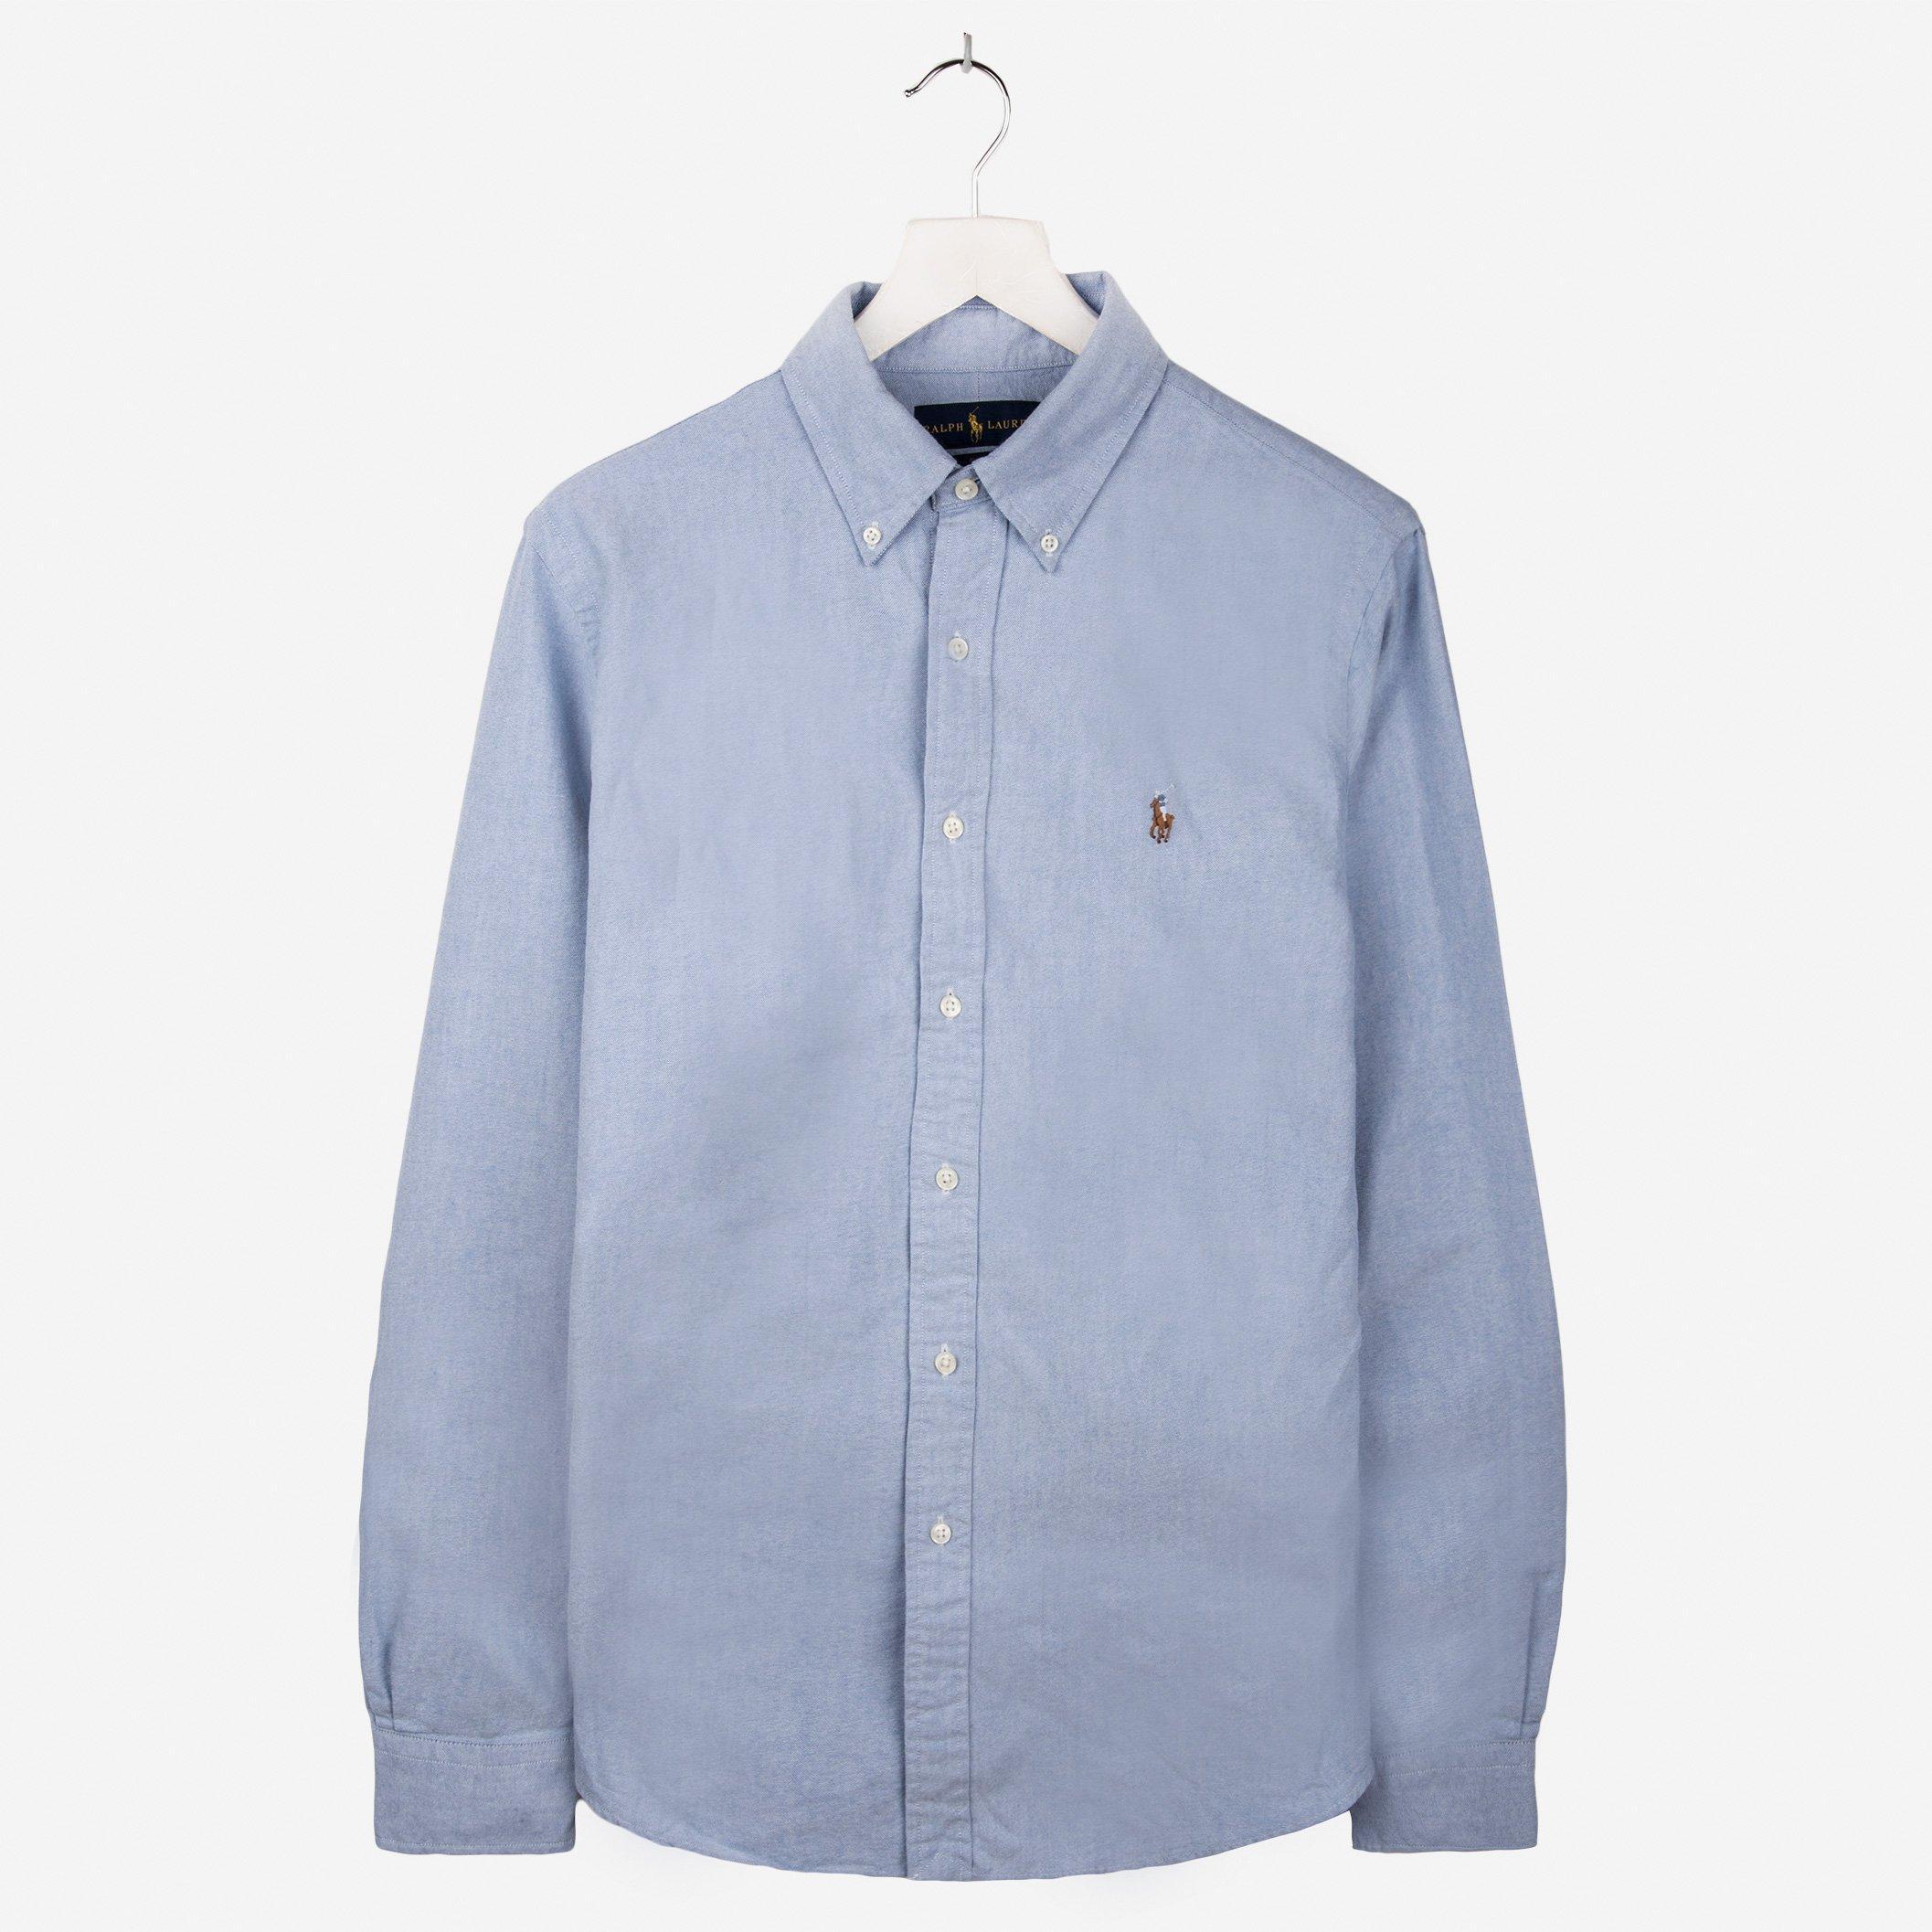 Polo Ralph Lauren Slim Fit Oxford BD Shirt BSR